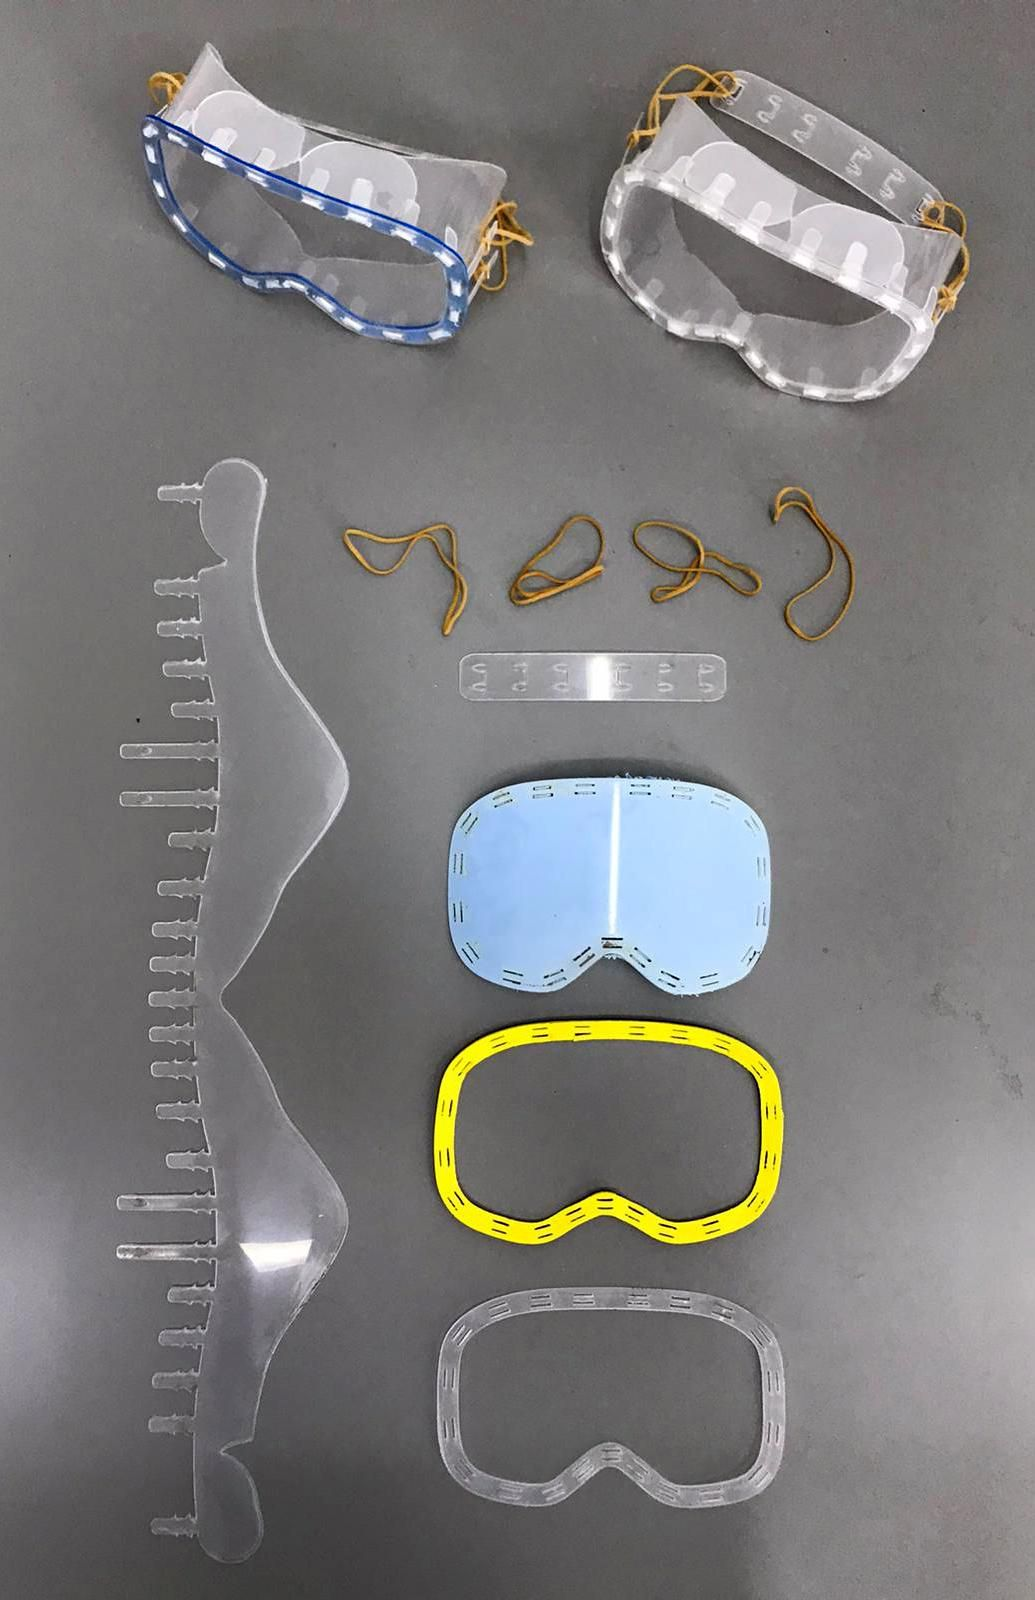 Foto de Prototipo de las gafas sanitarias